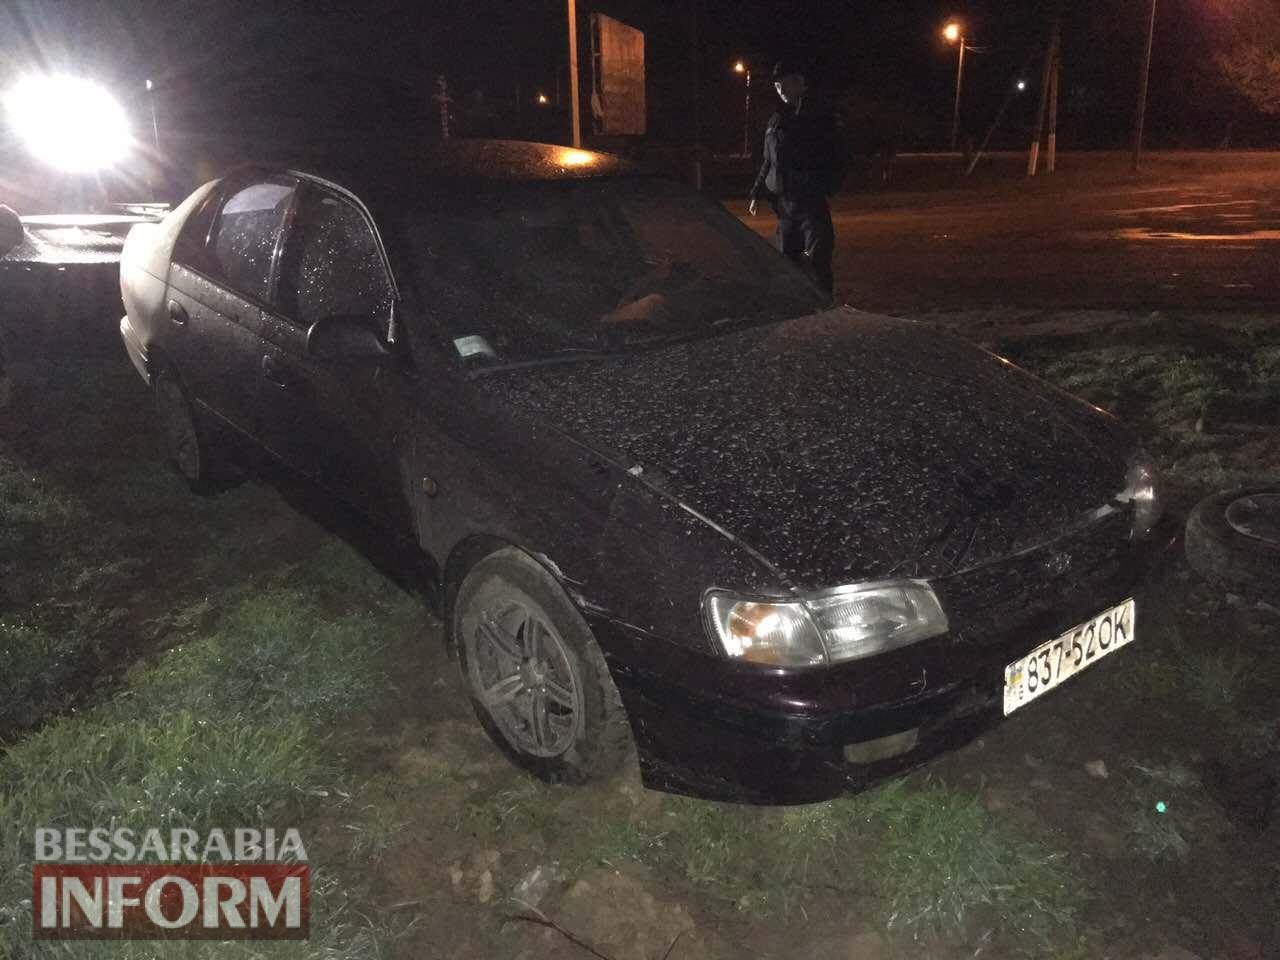 58fd0e5d8d772_viber-image На въезде в Измаил пьяный водитель на Toyota Carina снес столб